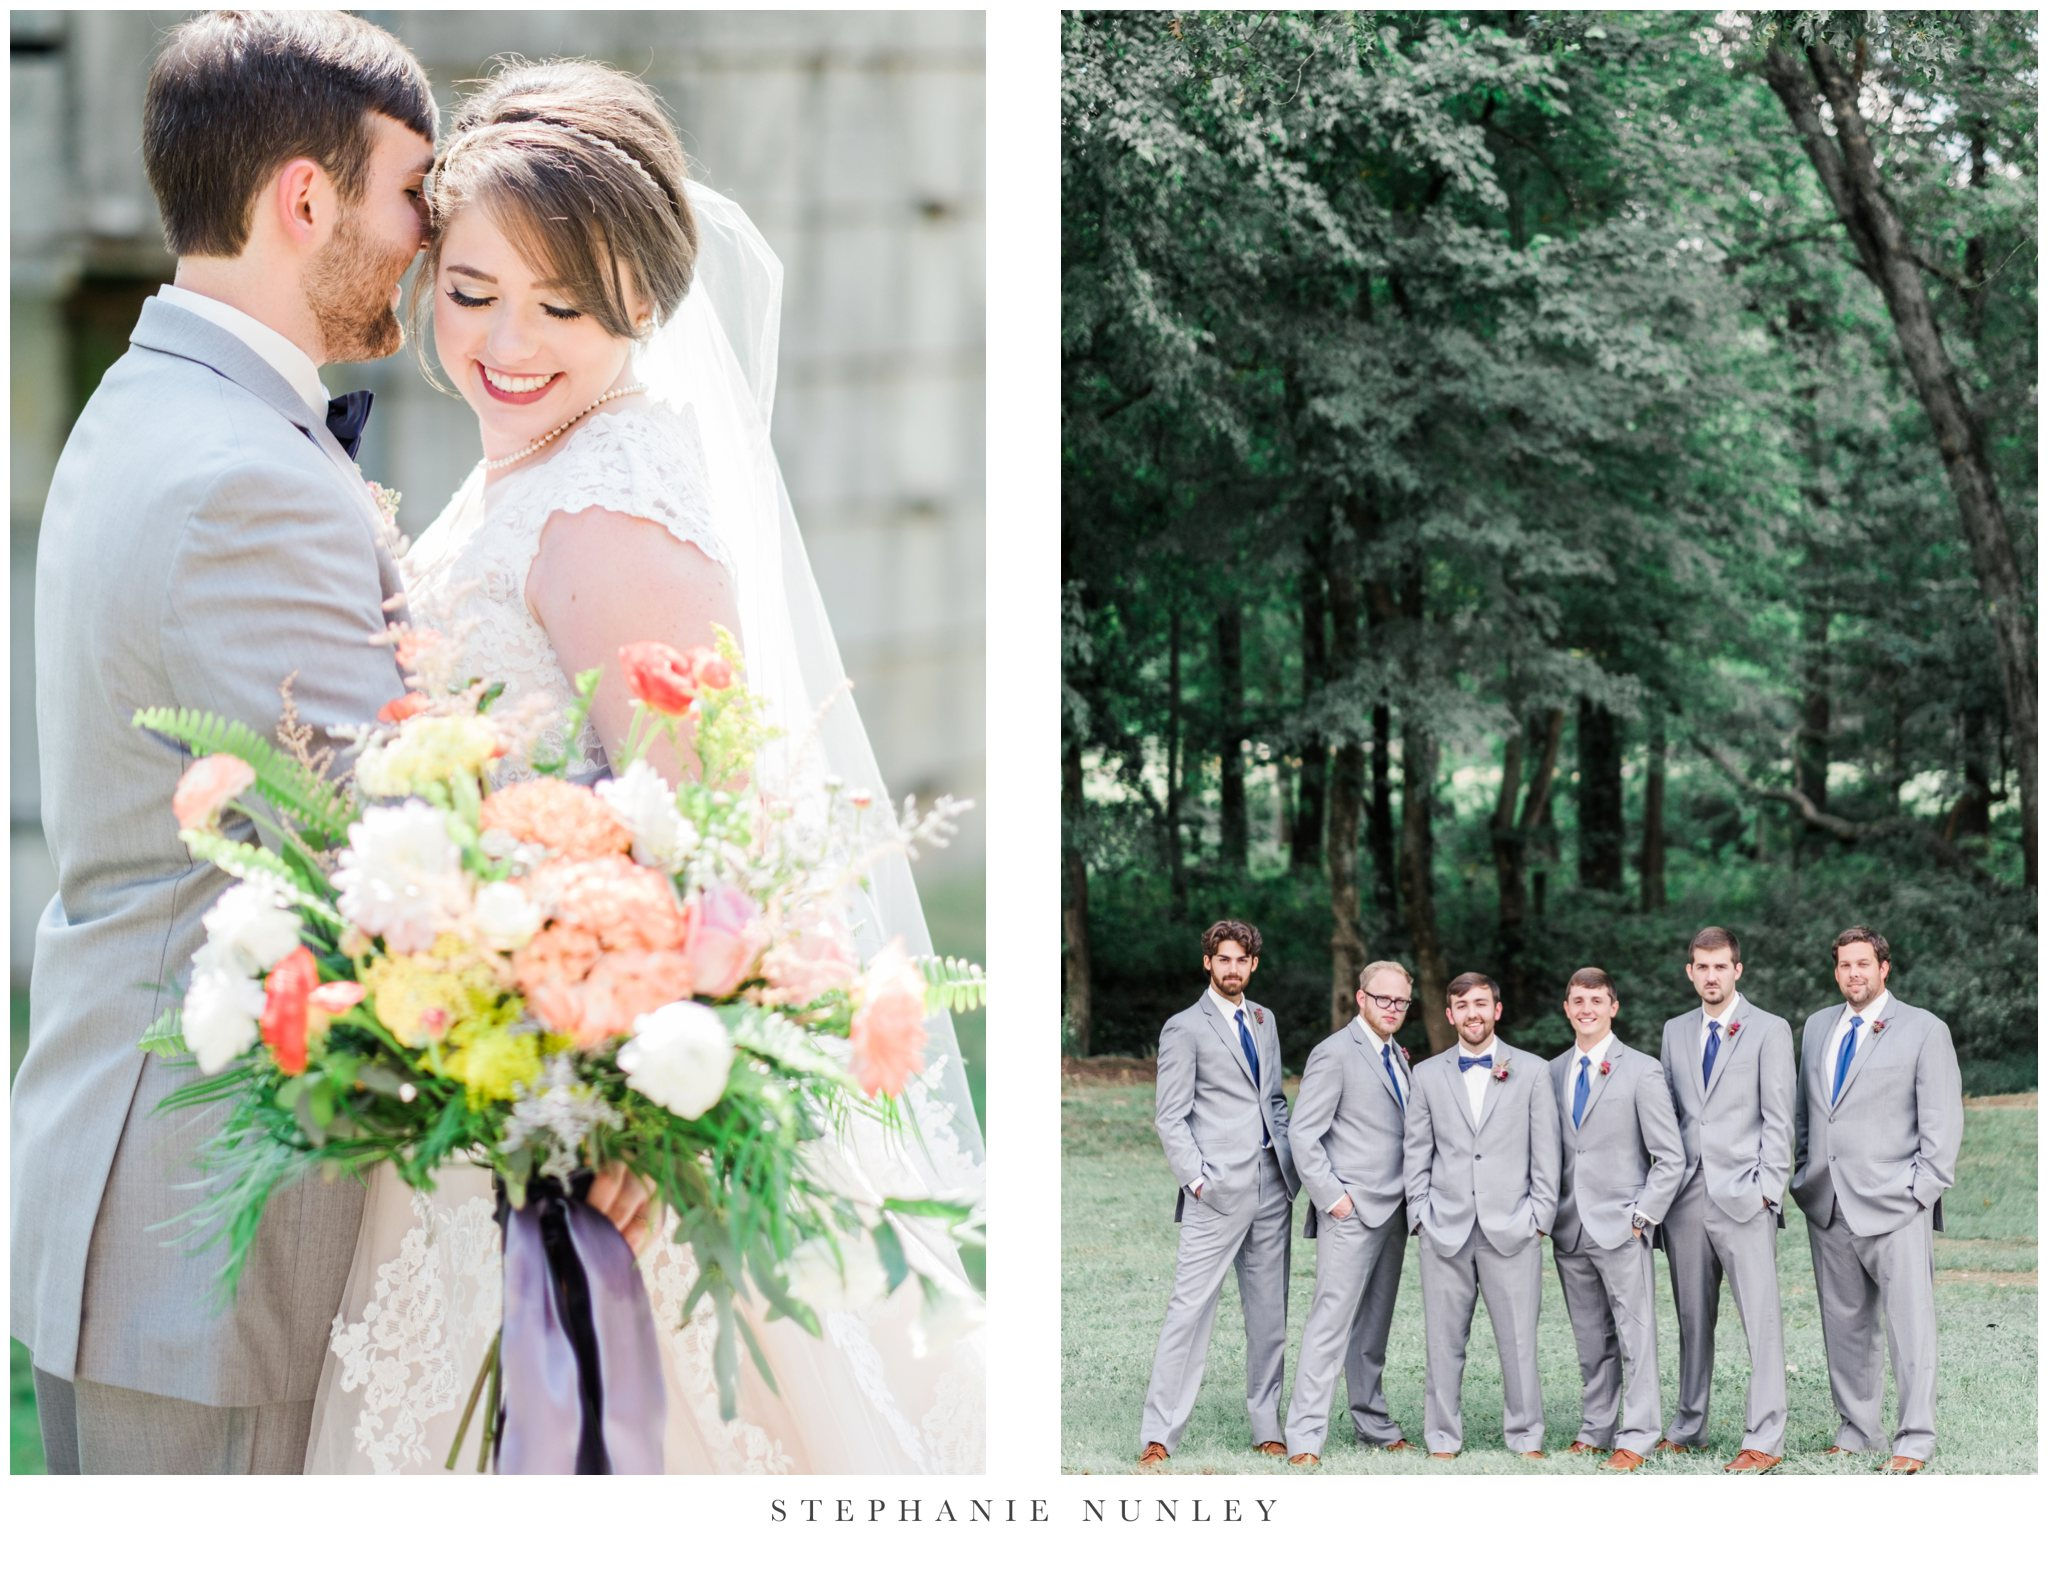 arkansas-wedding-with-lush-wildflower-bouquet-0044.jpg